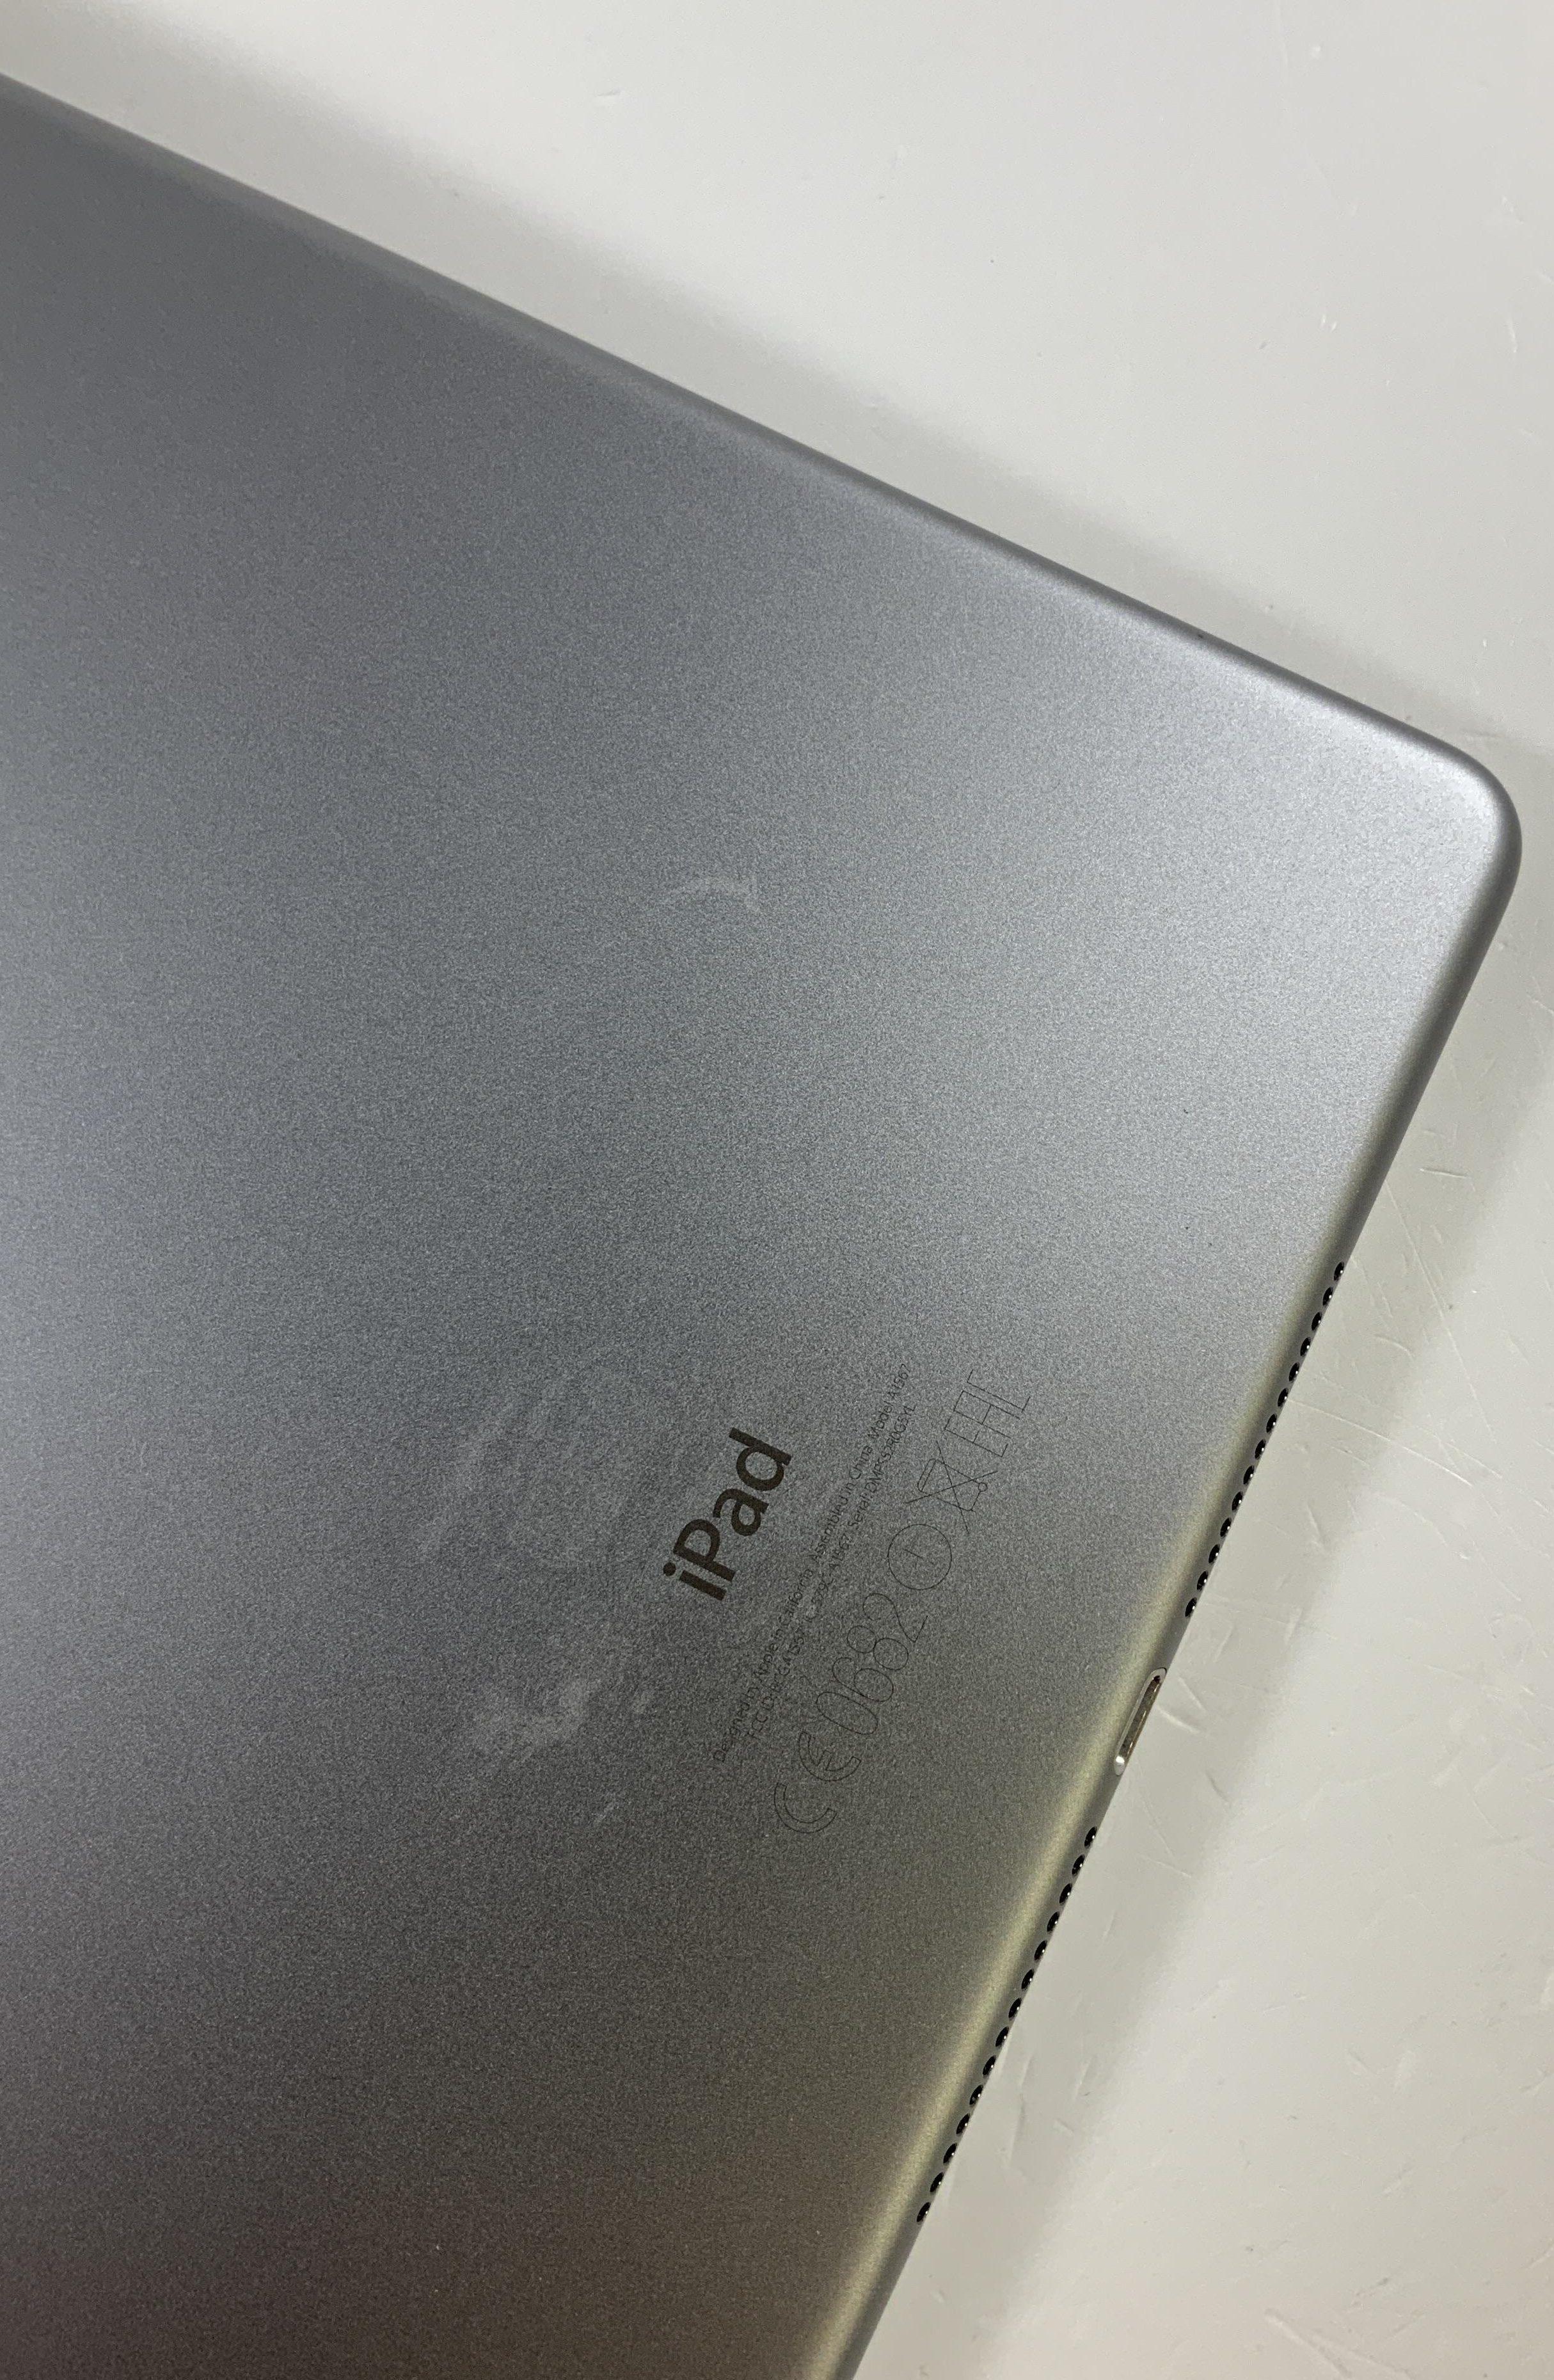 iPad Air 2 Wi-Fi + Cellular 64GB, 64GB, Space Gray, immagine 3